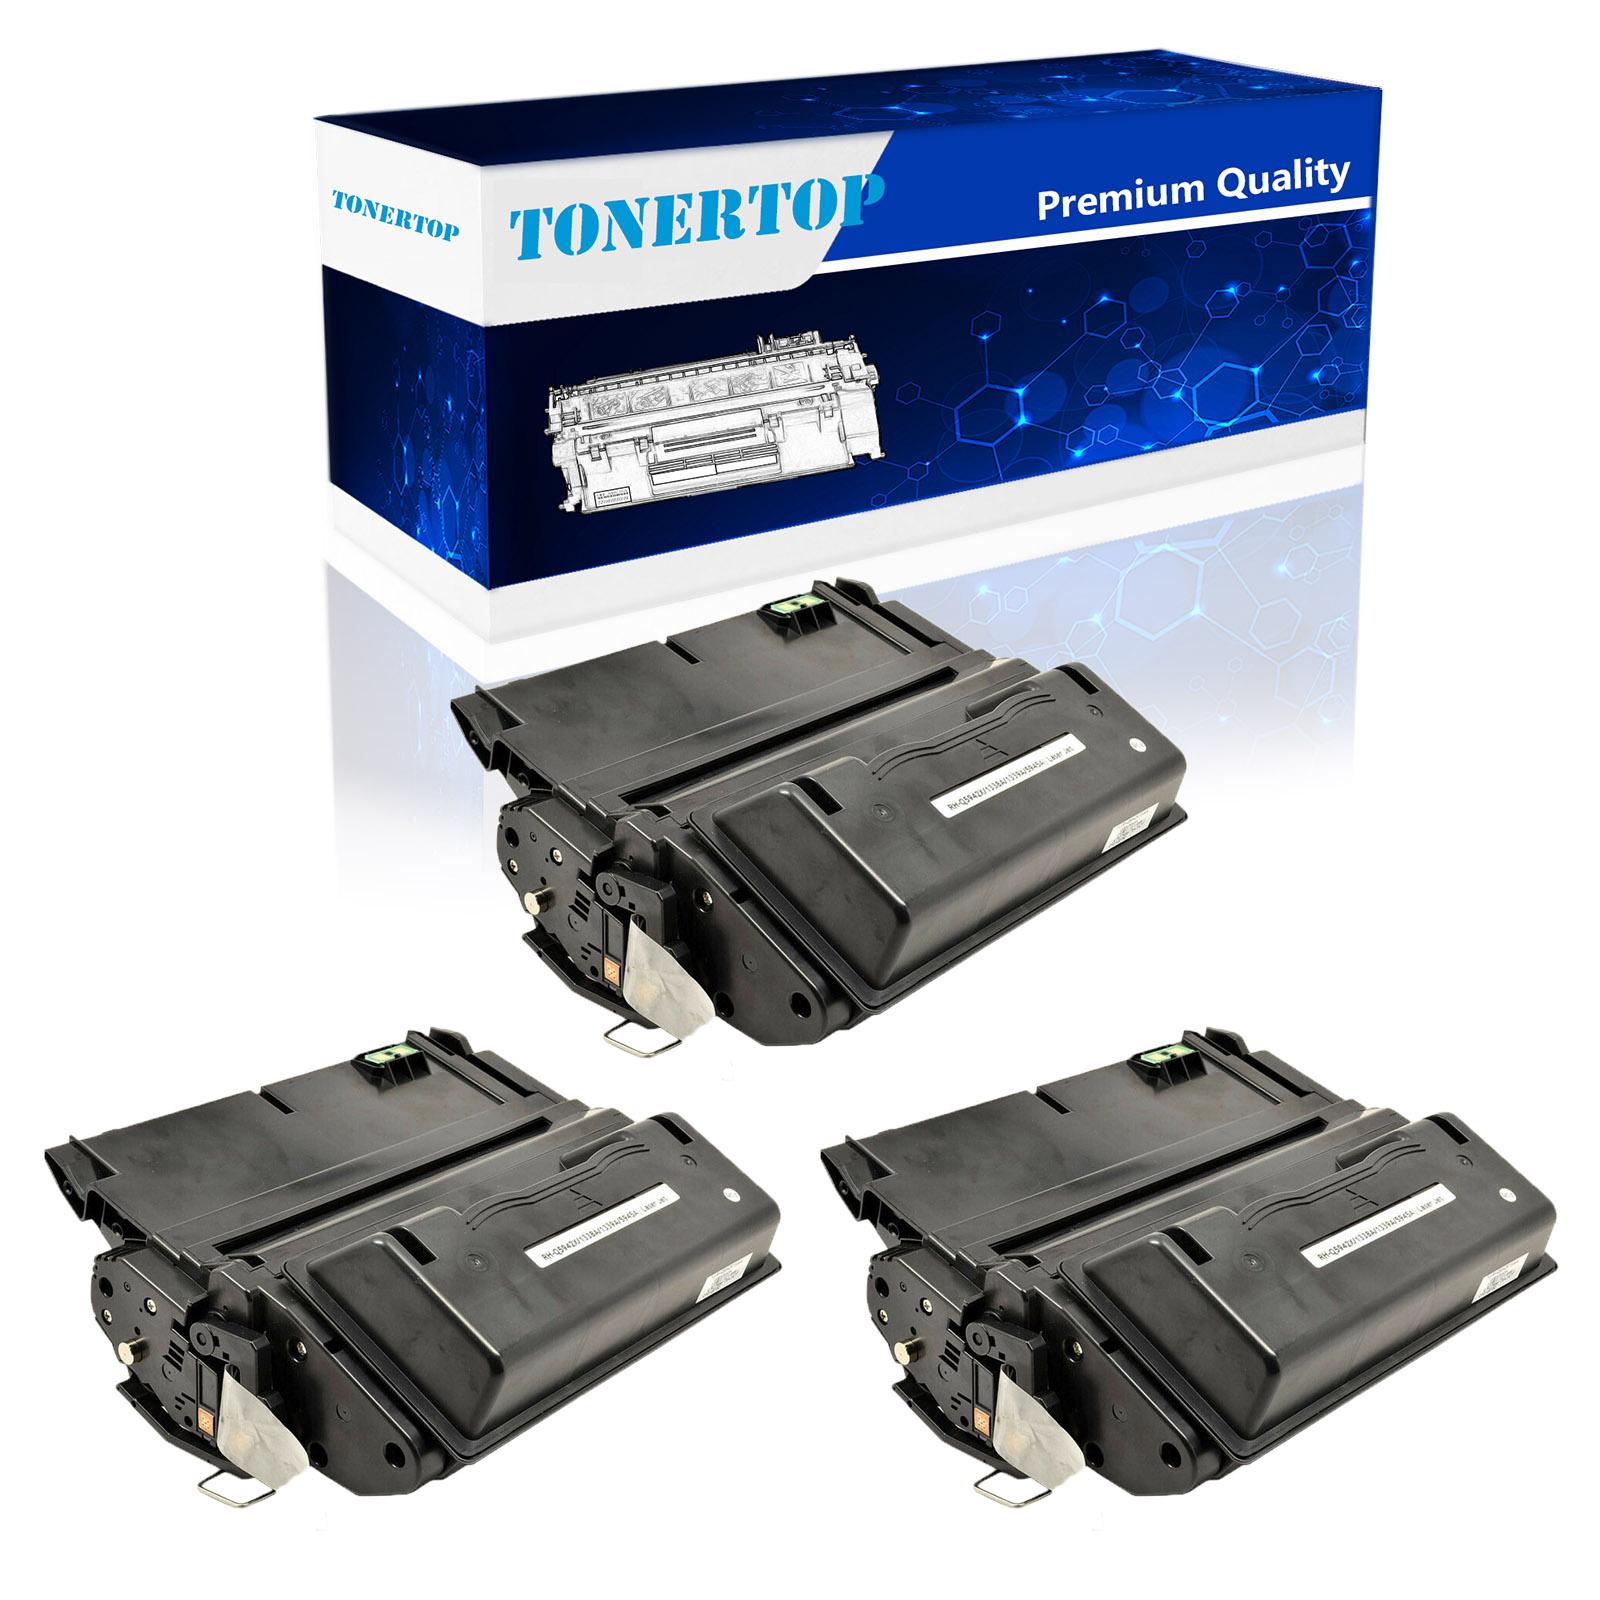 2 PK  Replacement For HP Q1338A Black Toner Cartridge Laserjet 4200dtnsl 4200tn